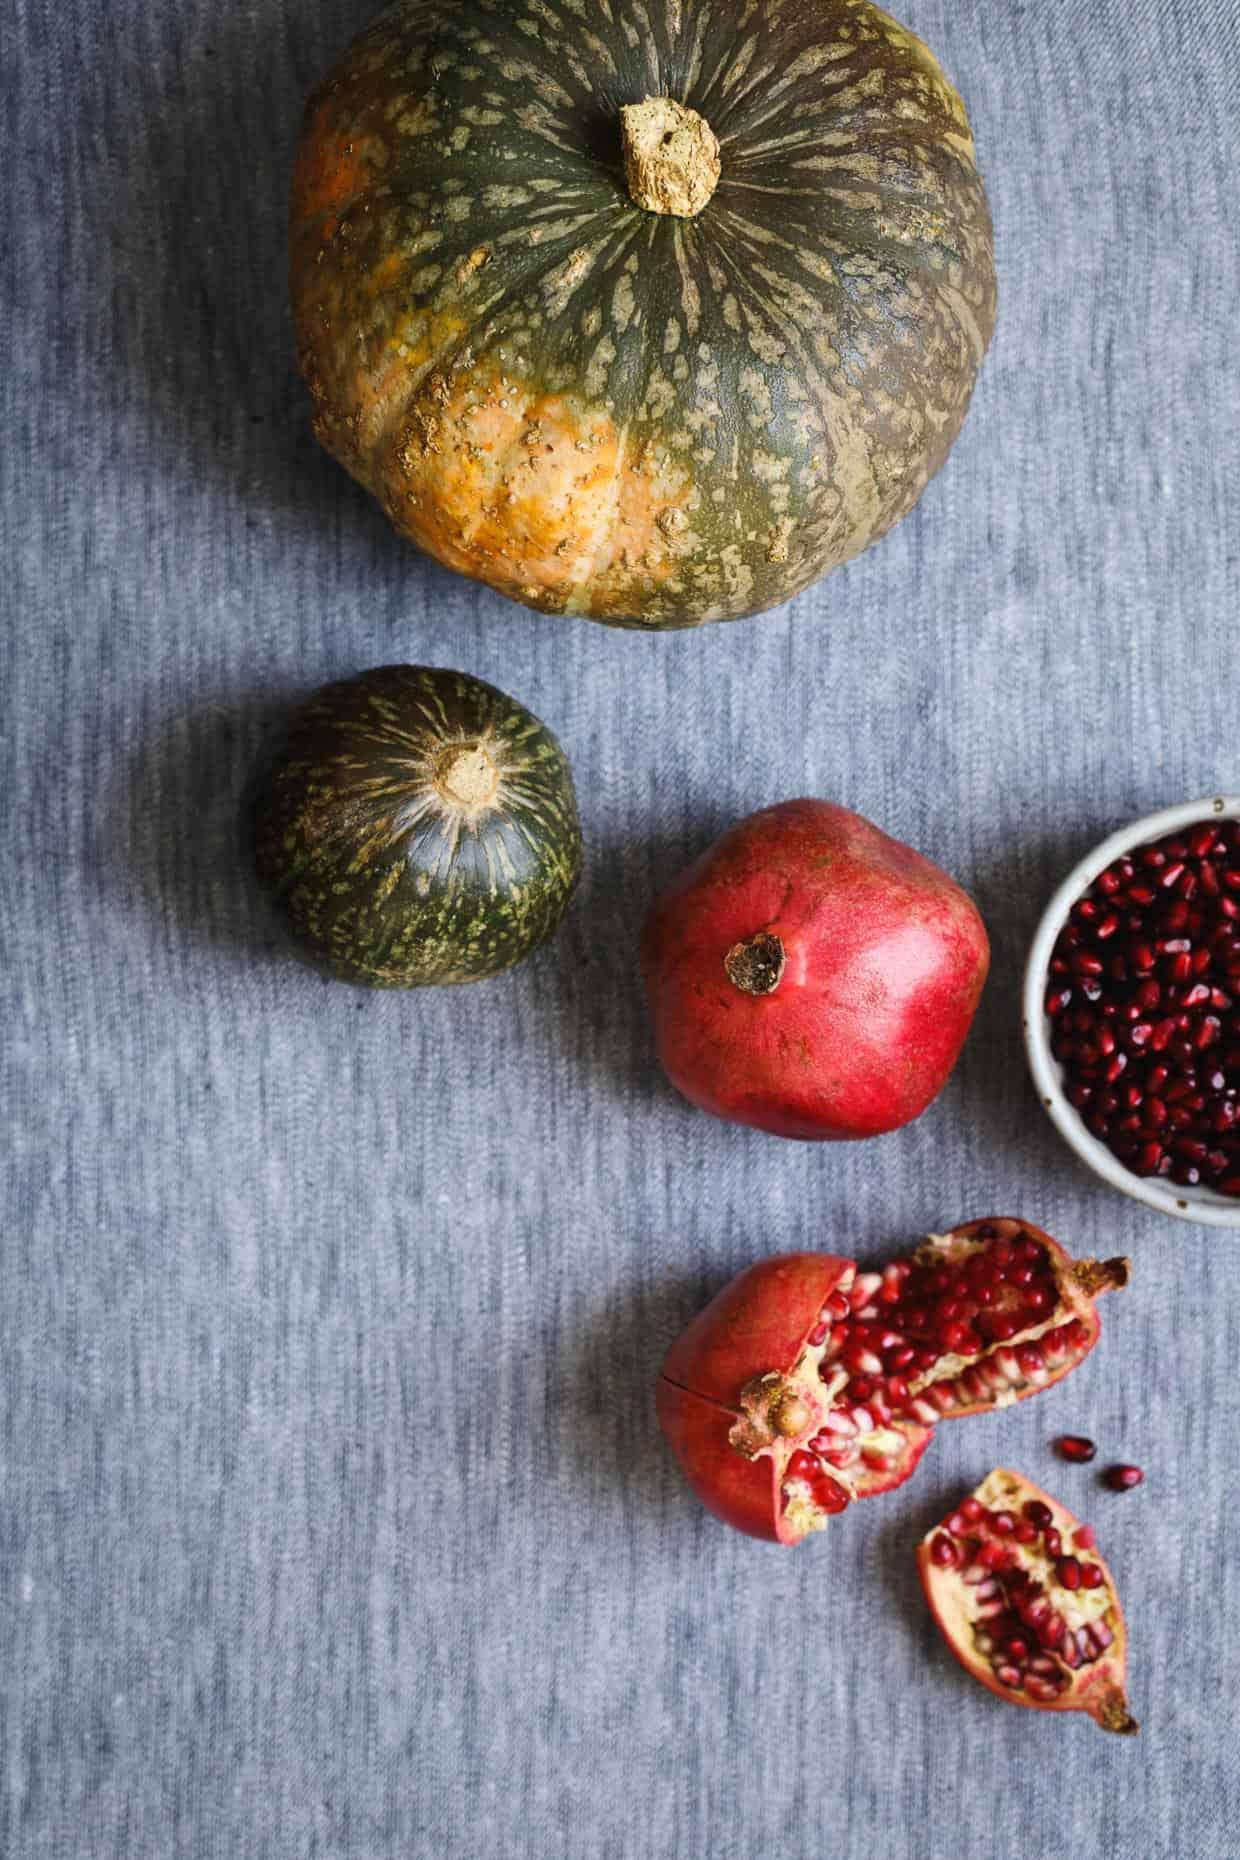 Kabocha squash and pomegranates